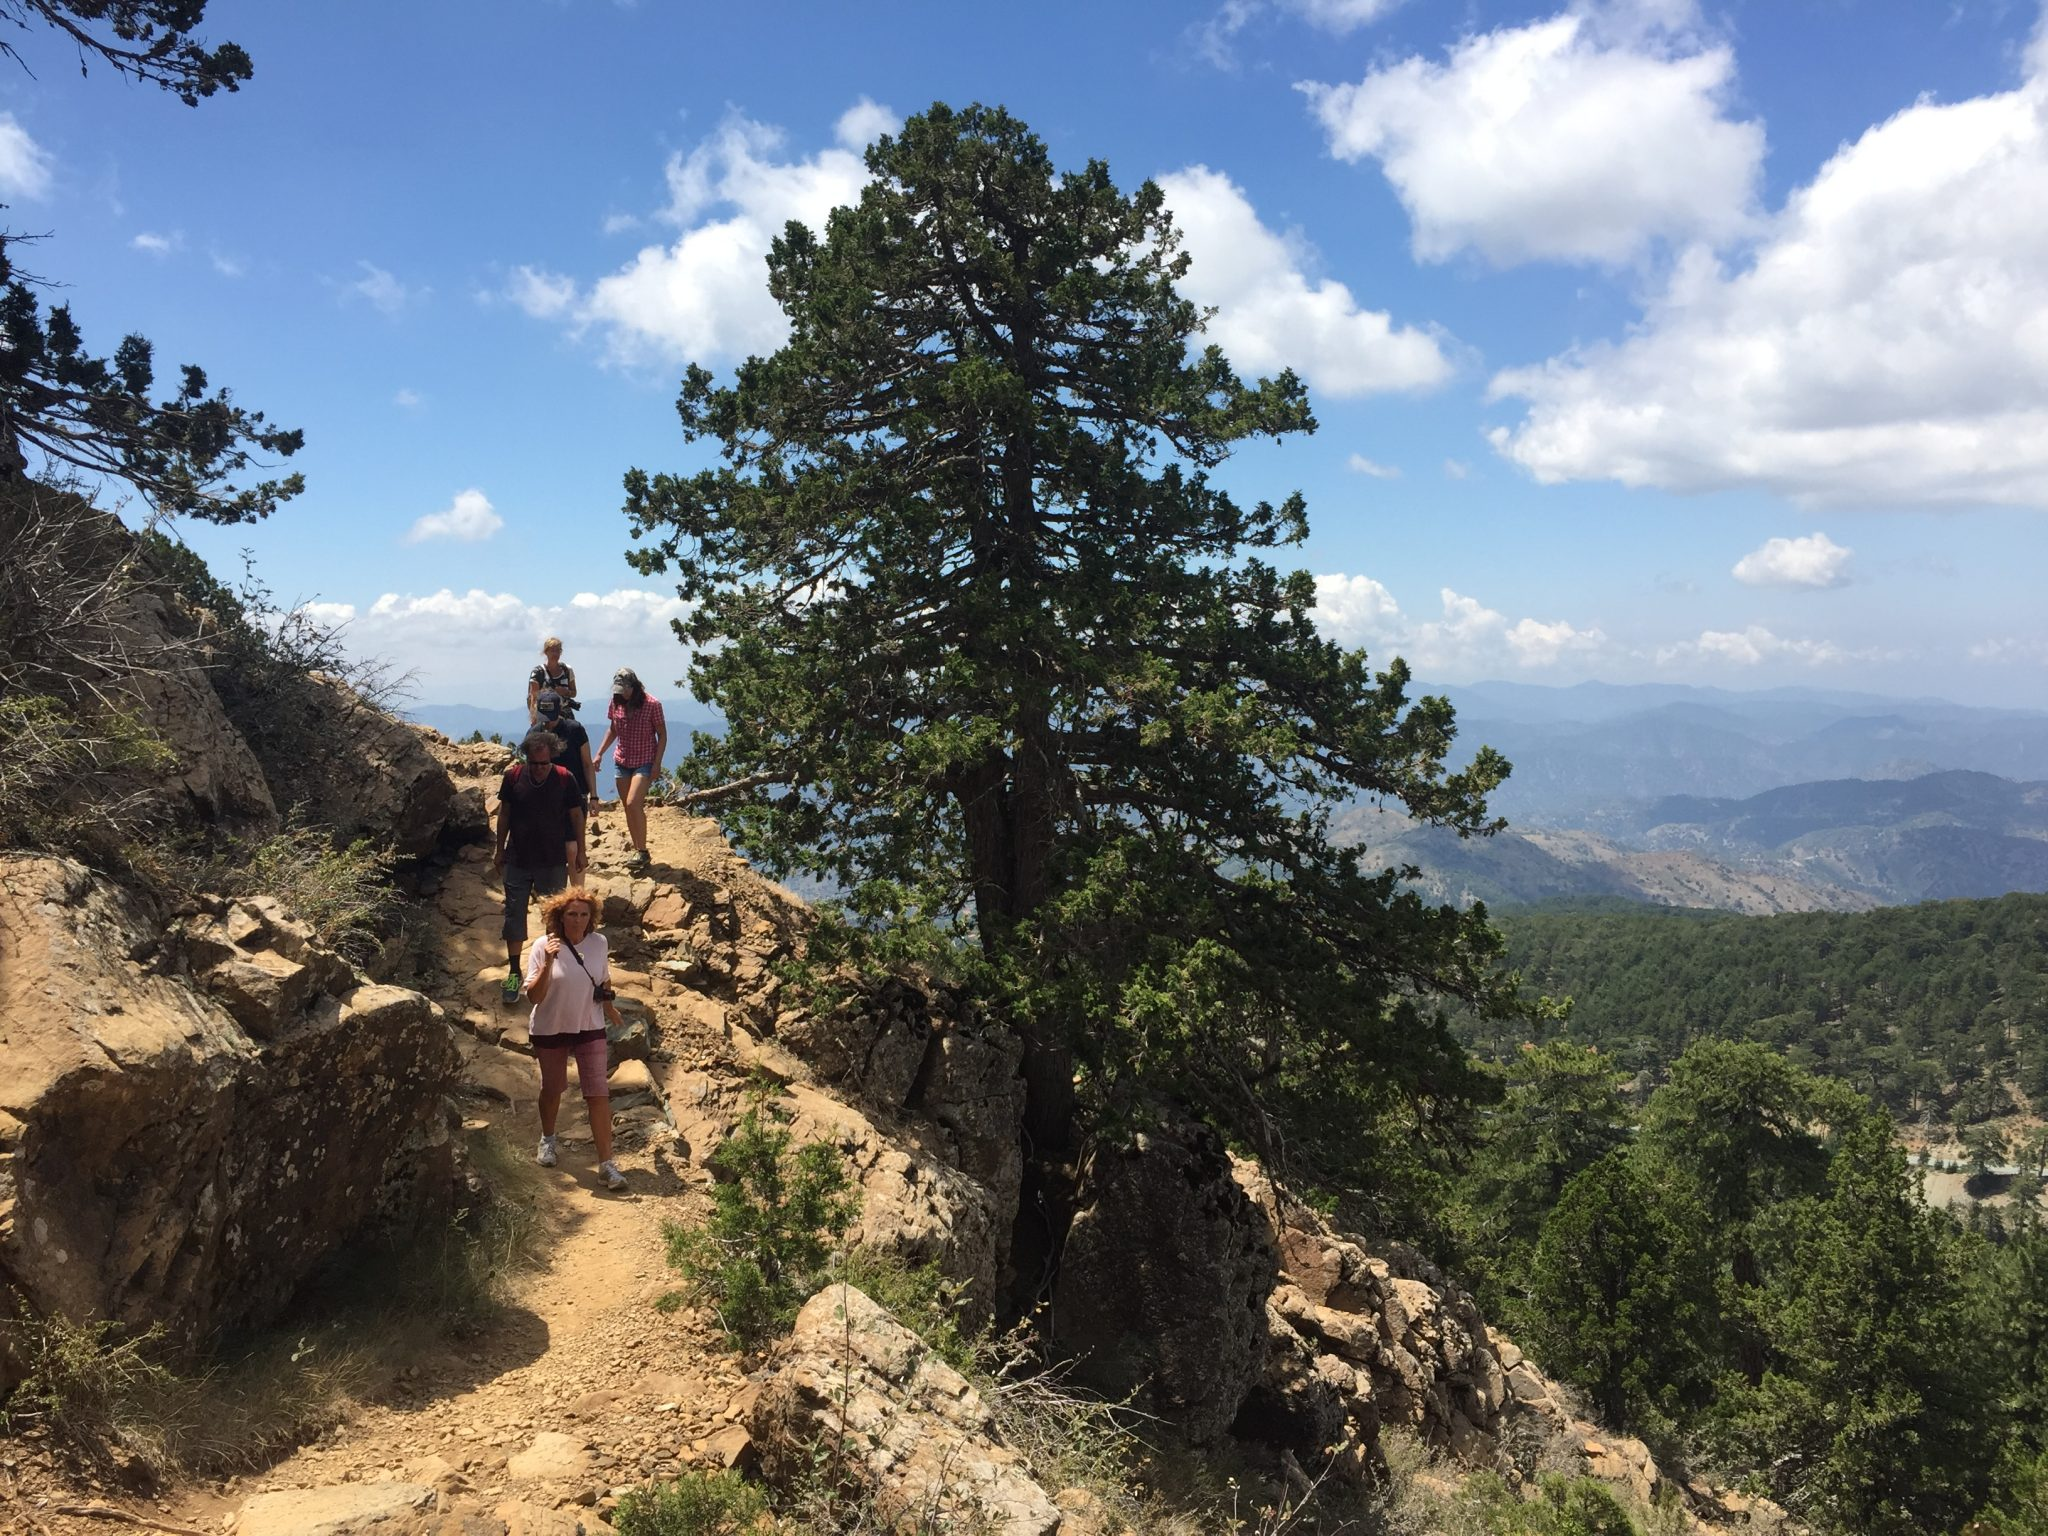 Wandern, Wanderung, Zypern, Olymp, Olympos, Troodos, Höchster Berg Zyperns, Ausflug, Kultur, Kulturausflug, Kulturreise, Natur, Naturausflug, Wald, Ophiolith, Troodos-Ophiolith, Jalos Activ Excursion, wandern auf zypern, wandernaufzypern.de